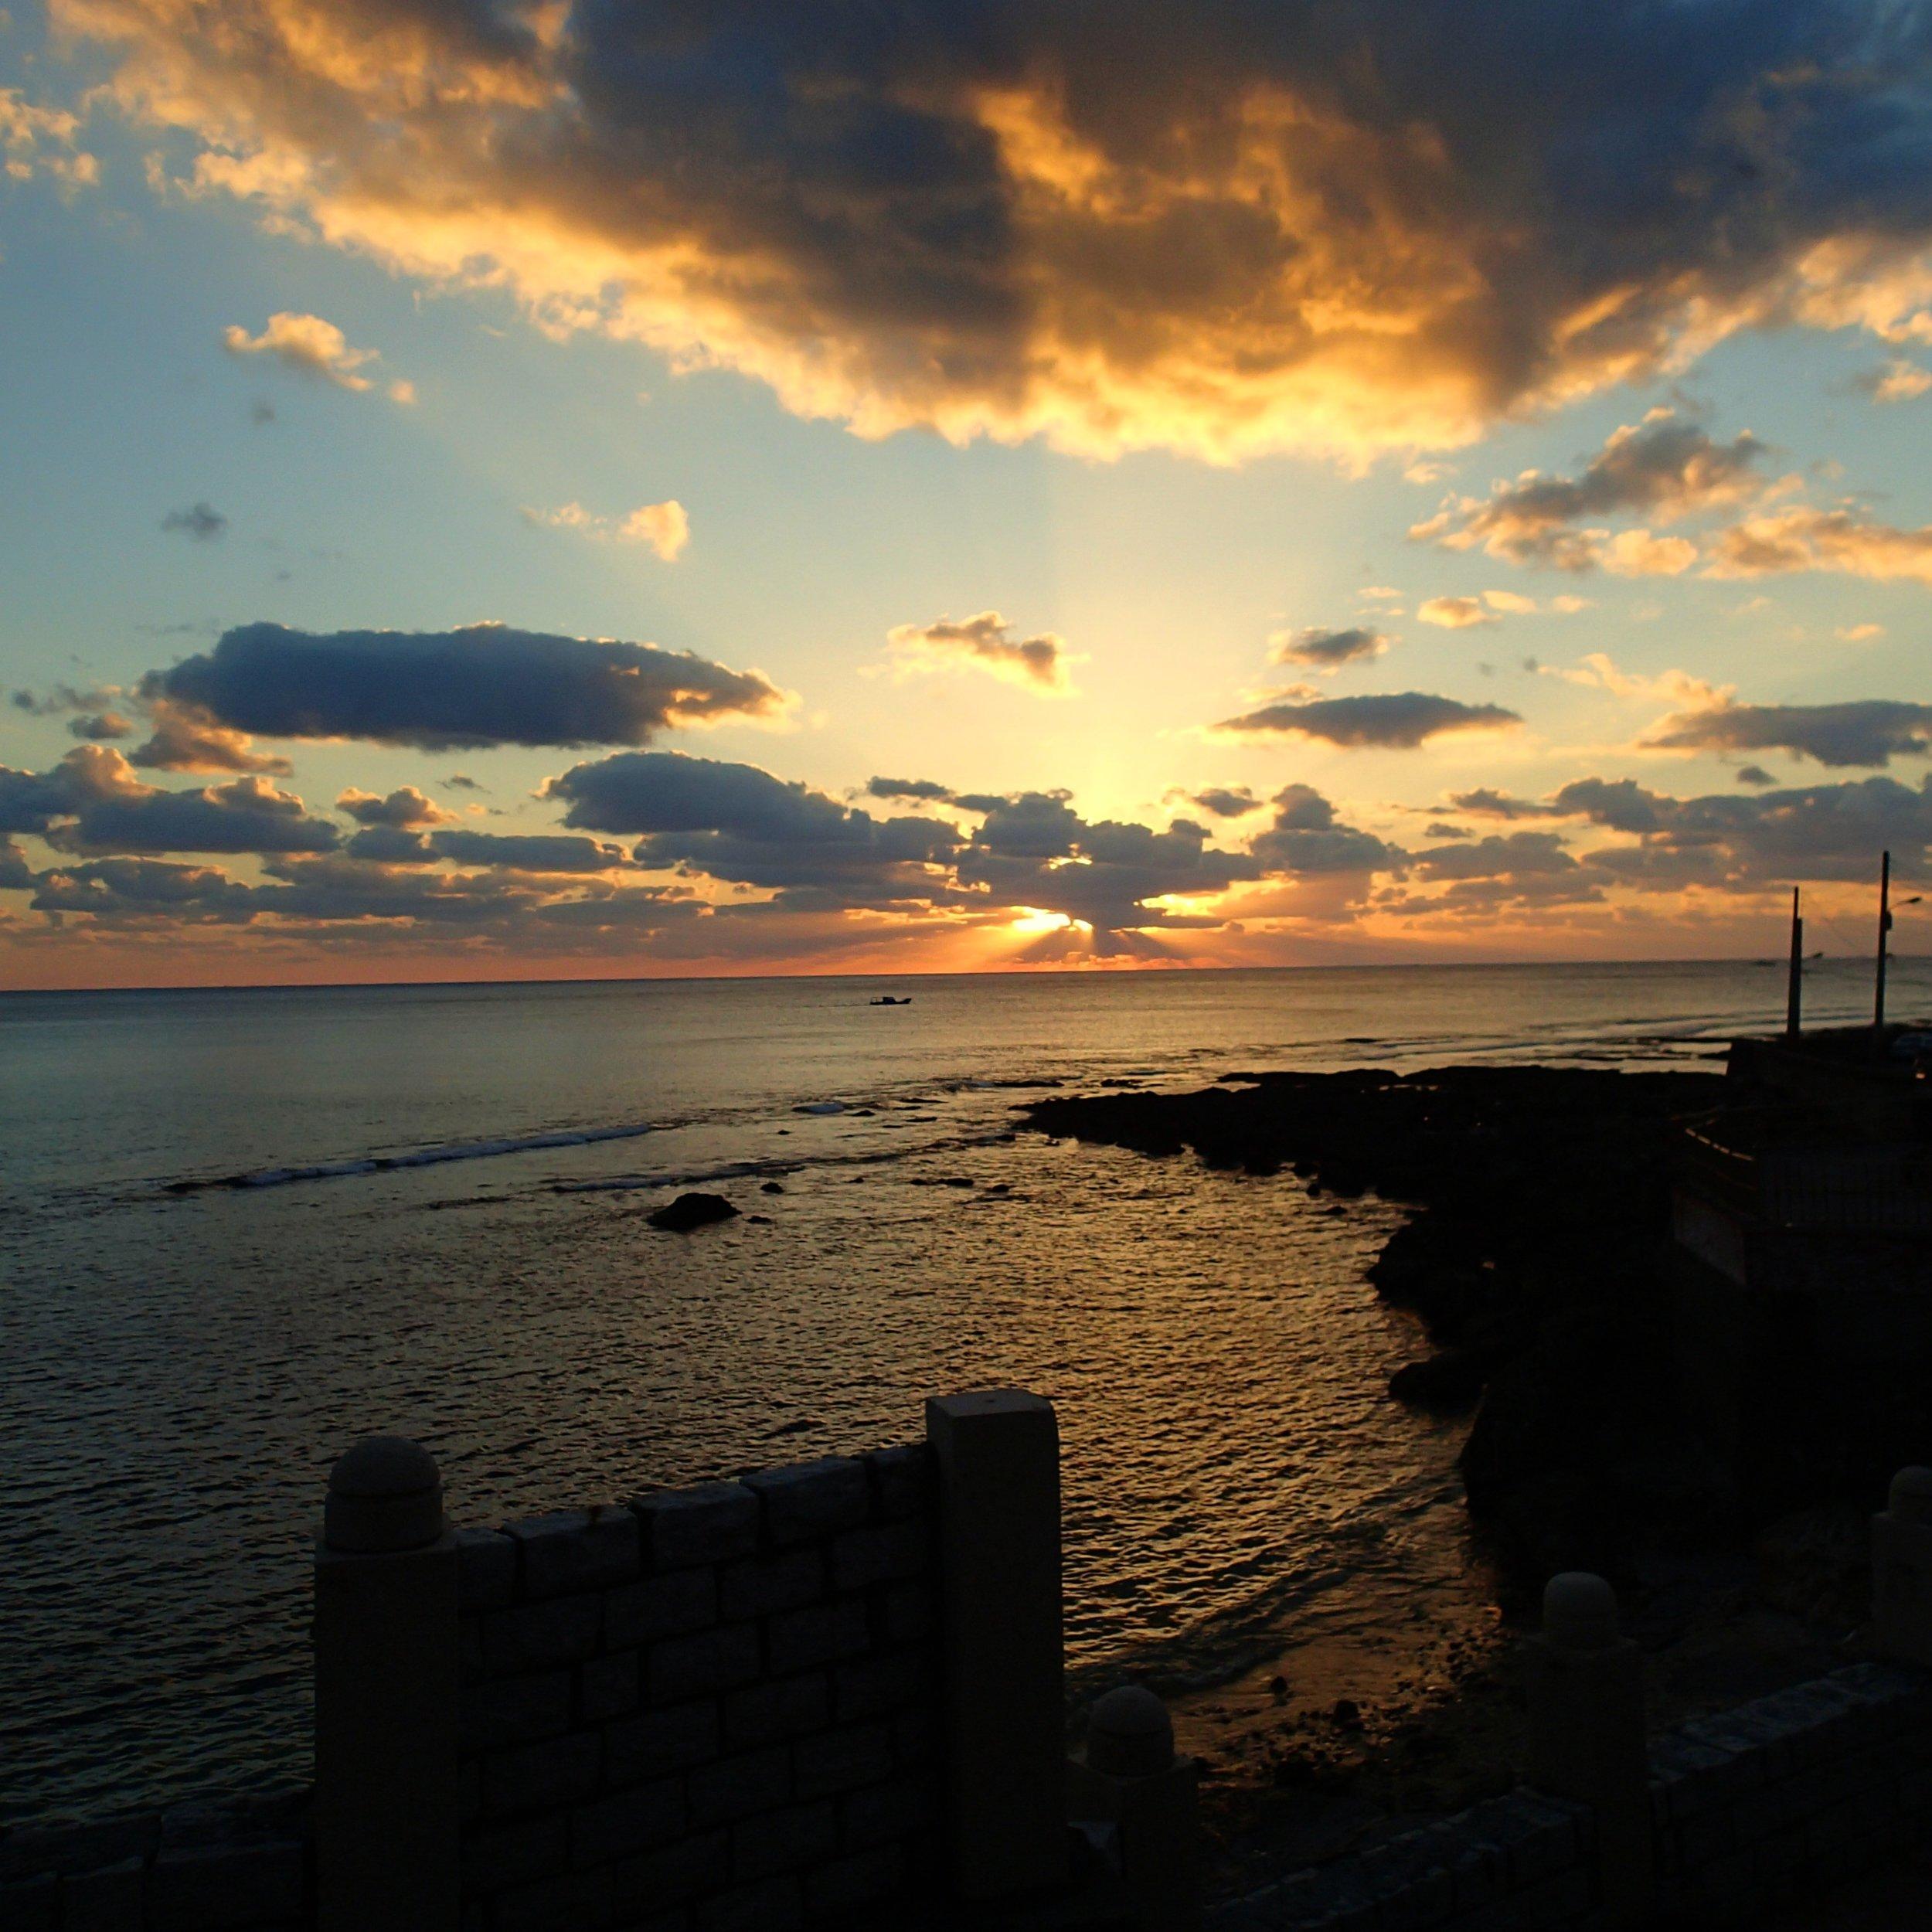 1-24-14 sunset.jpg